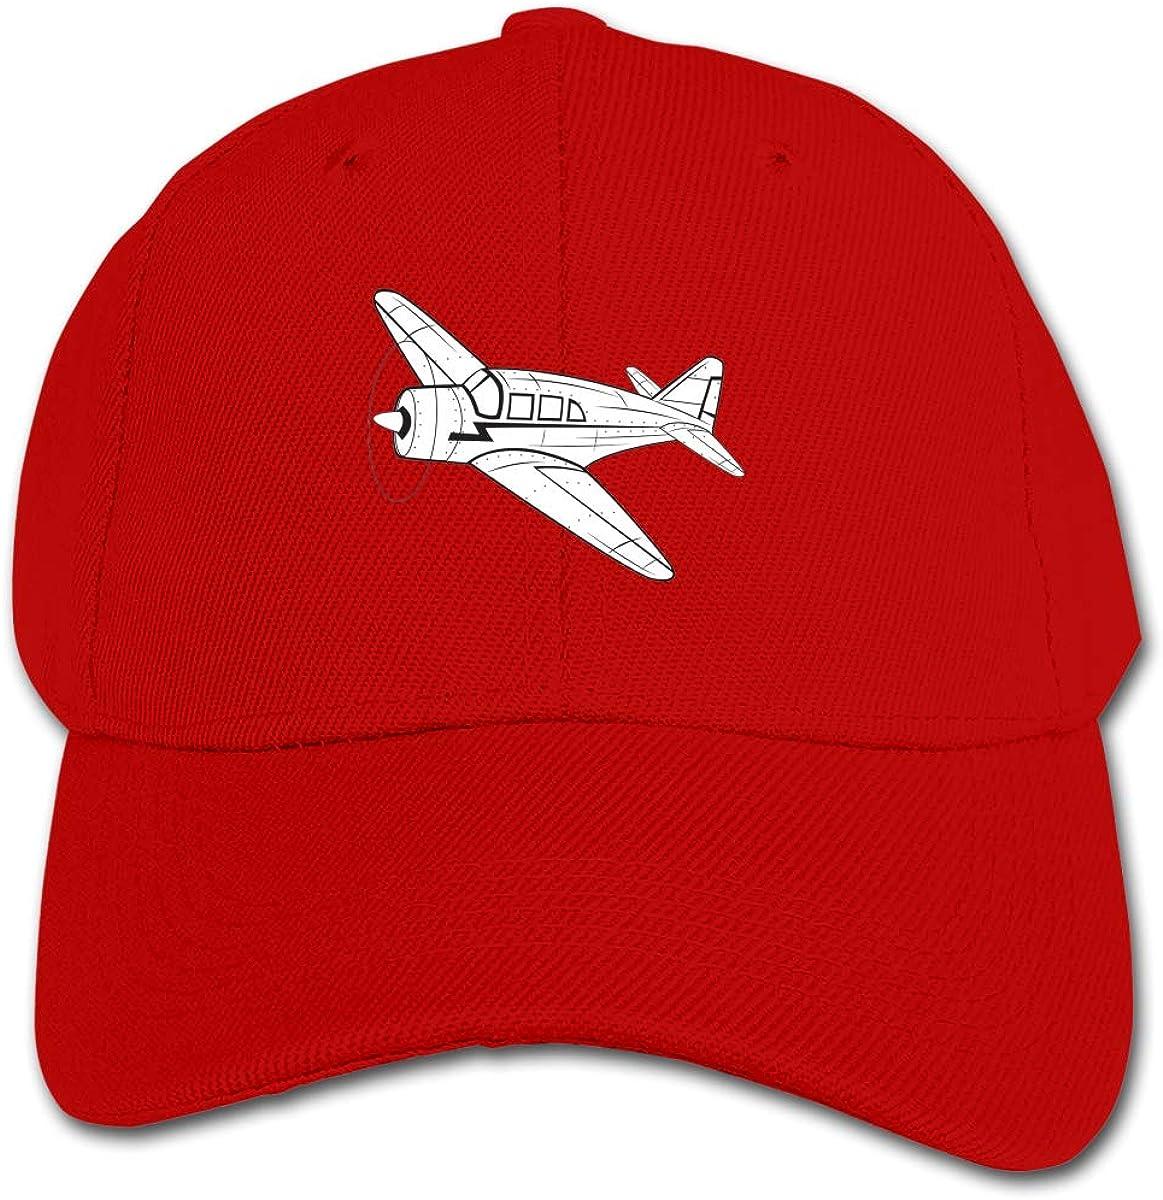 Toy AirplaneKids /& Toddler Baseball CapsDad Hats100/% Cotton